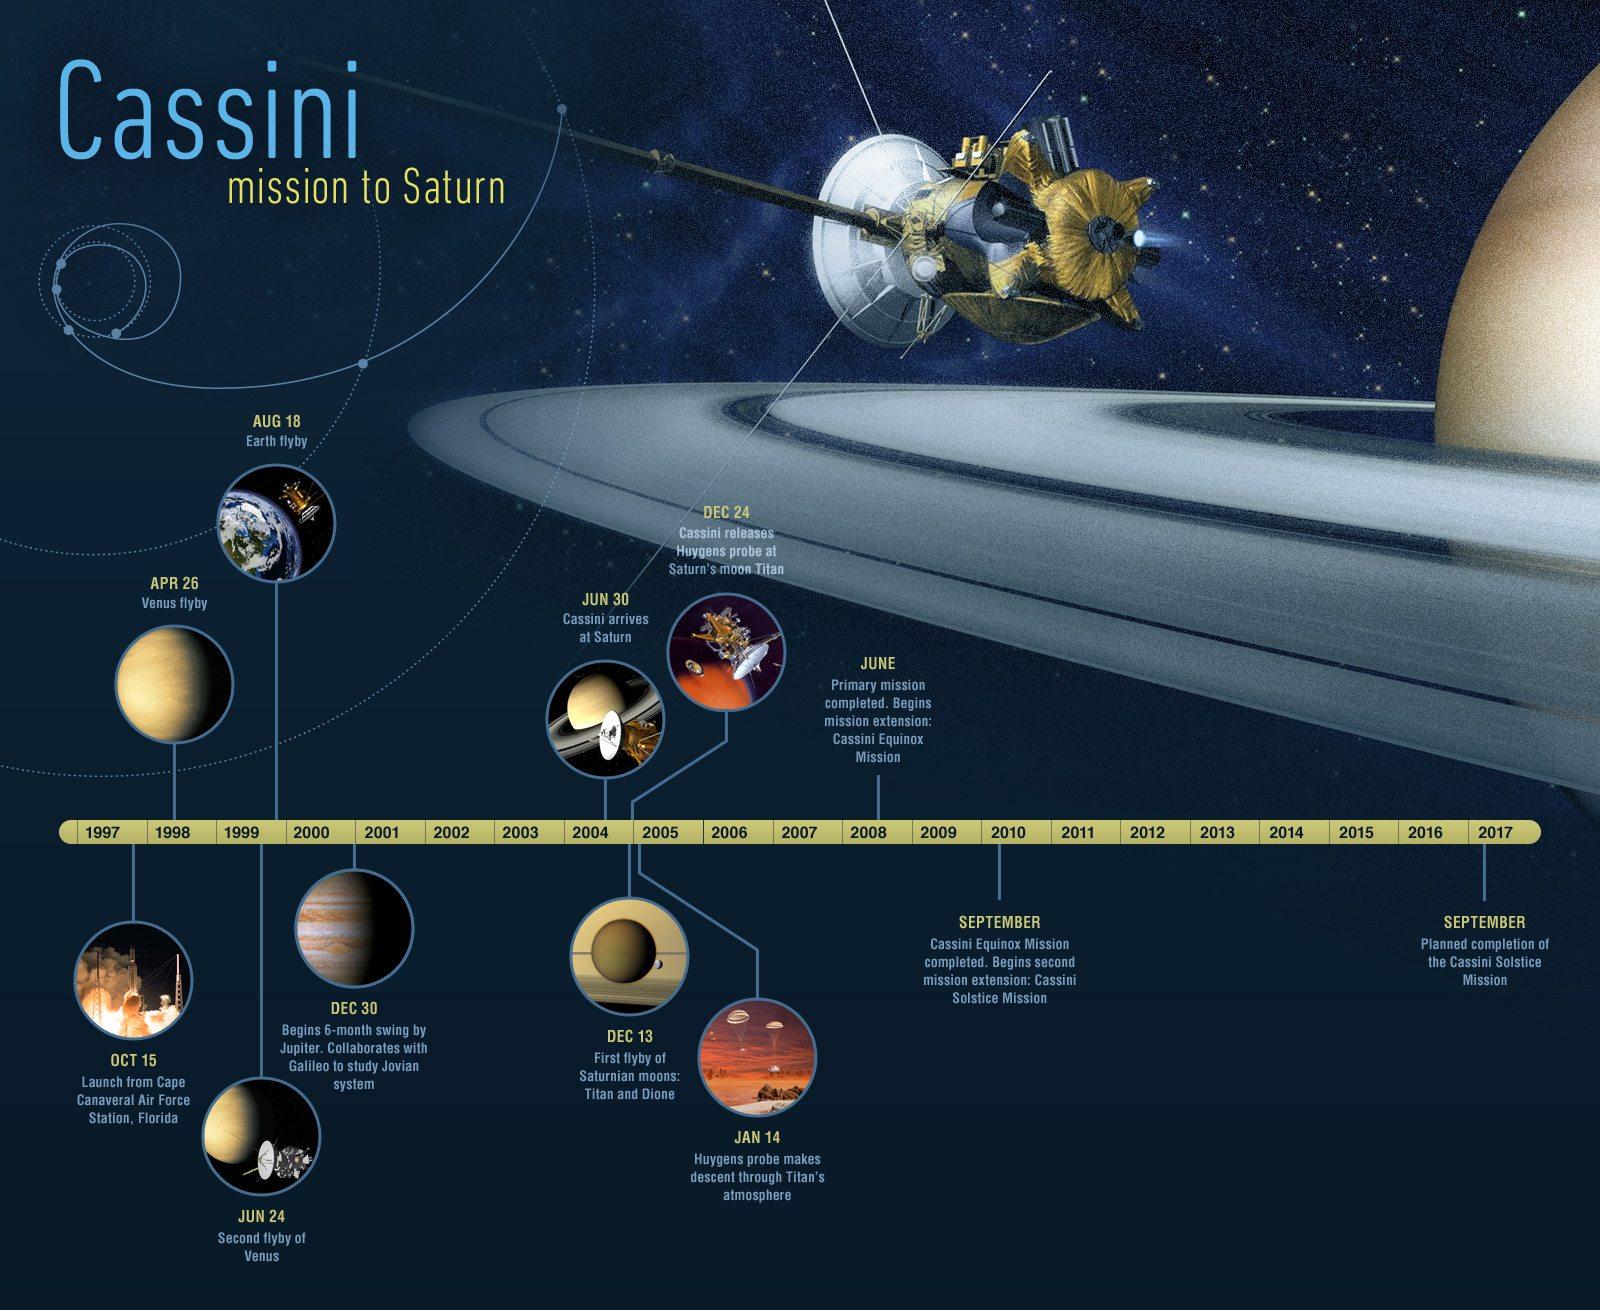 Image: NASA's timeline for Cassini's accomplishments